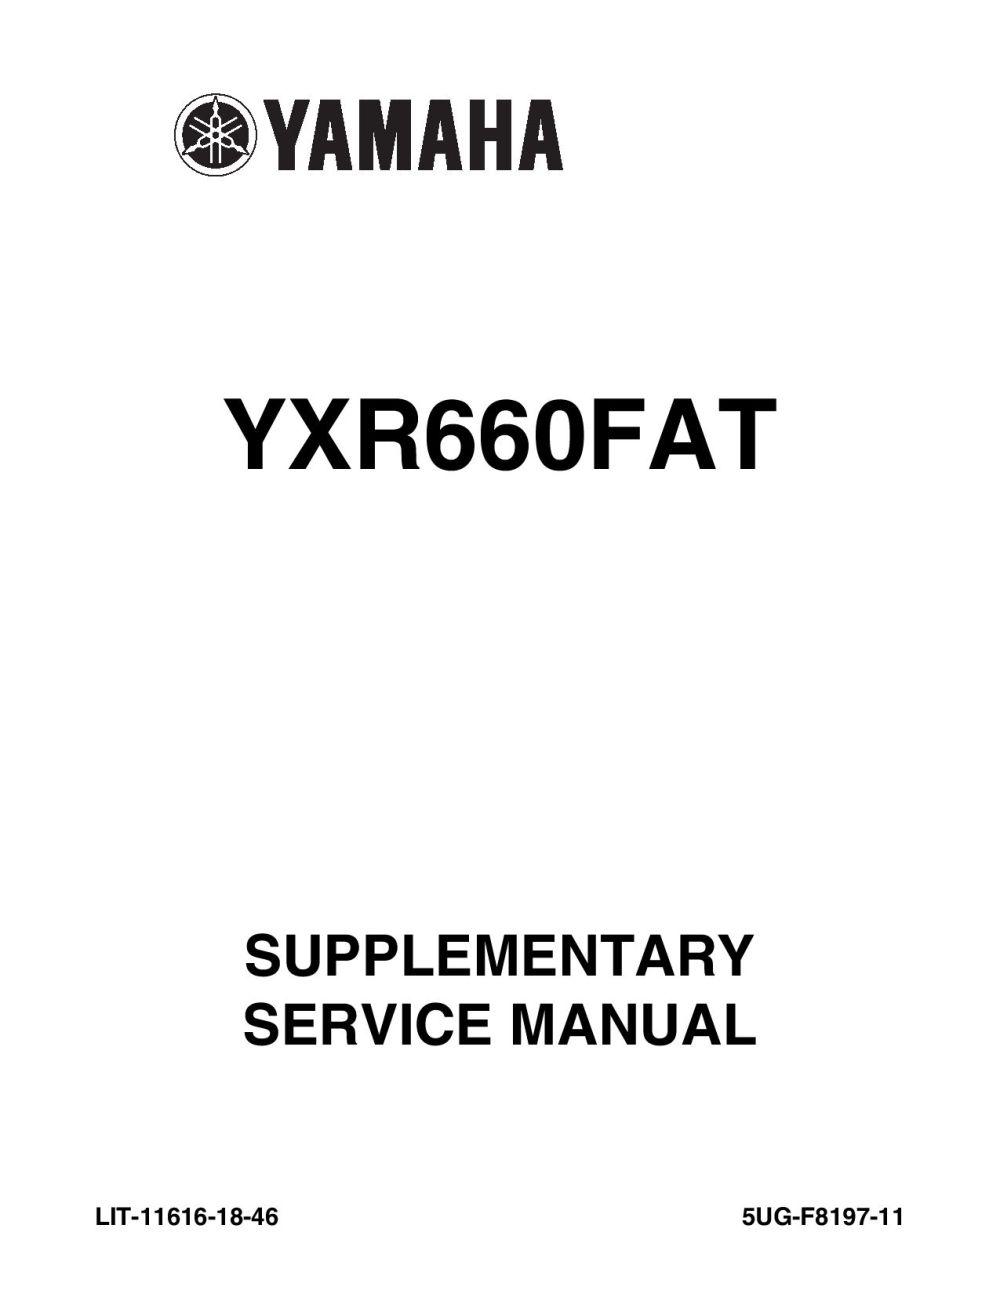 medium resolution of manual for the 660 yamaha rhino 04 07